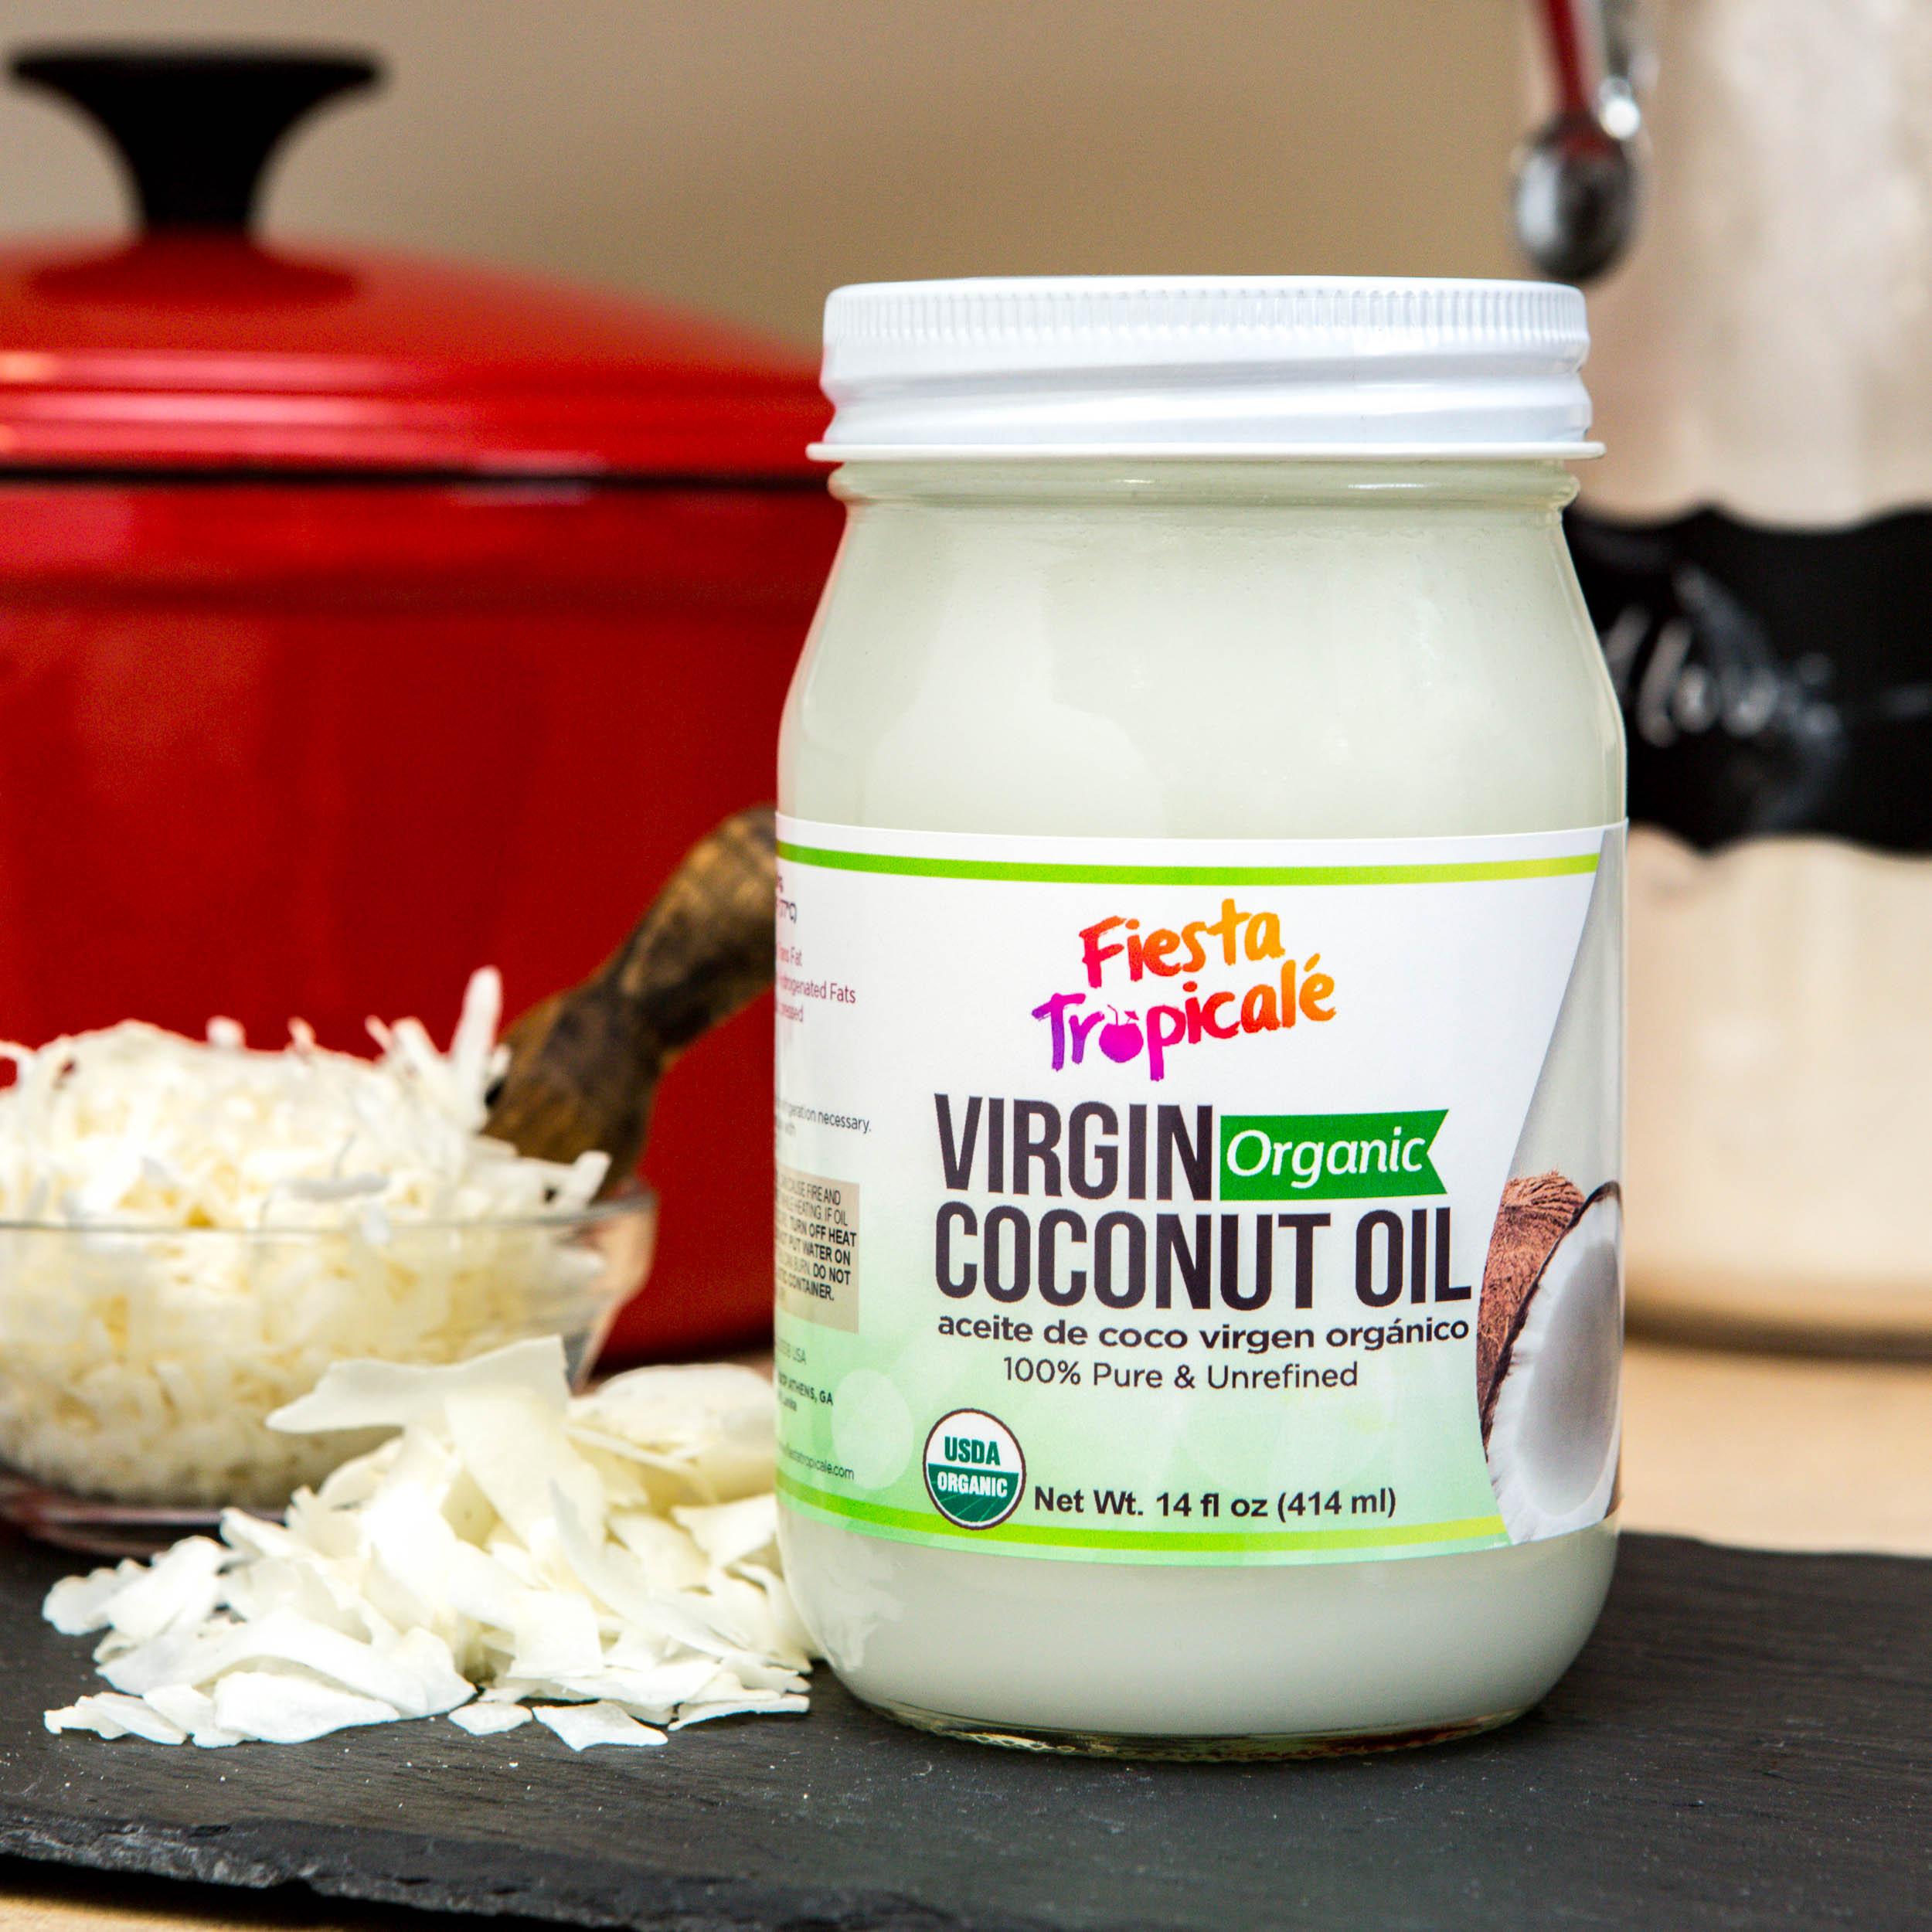 Fiesta Tropicale Organic Virgin Coconut Oil on Amazon